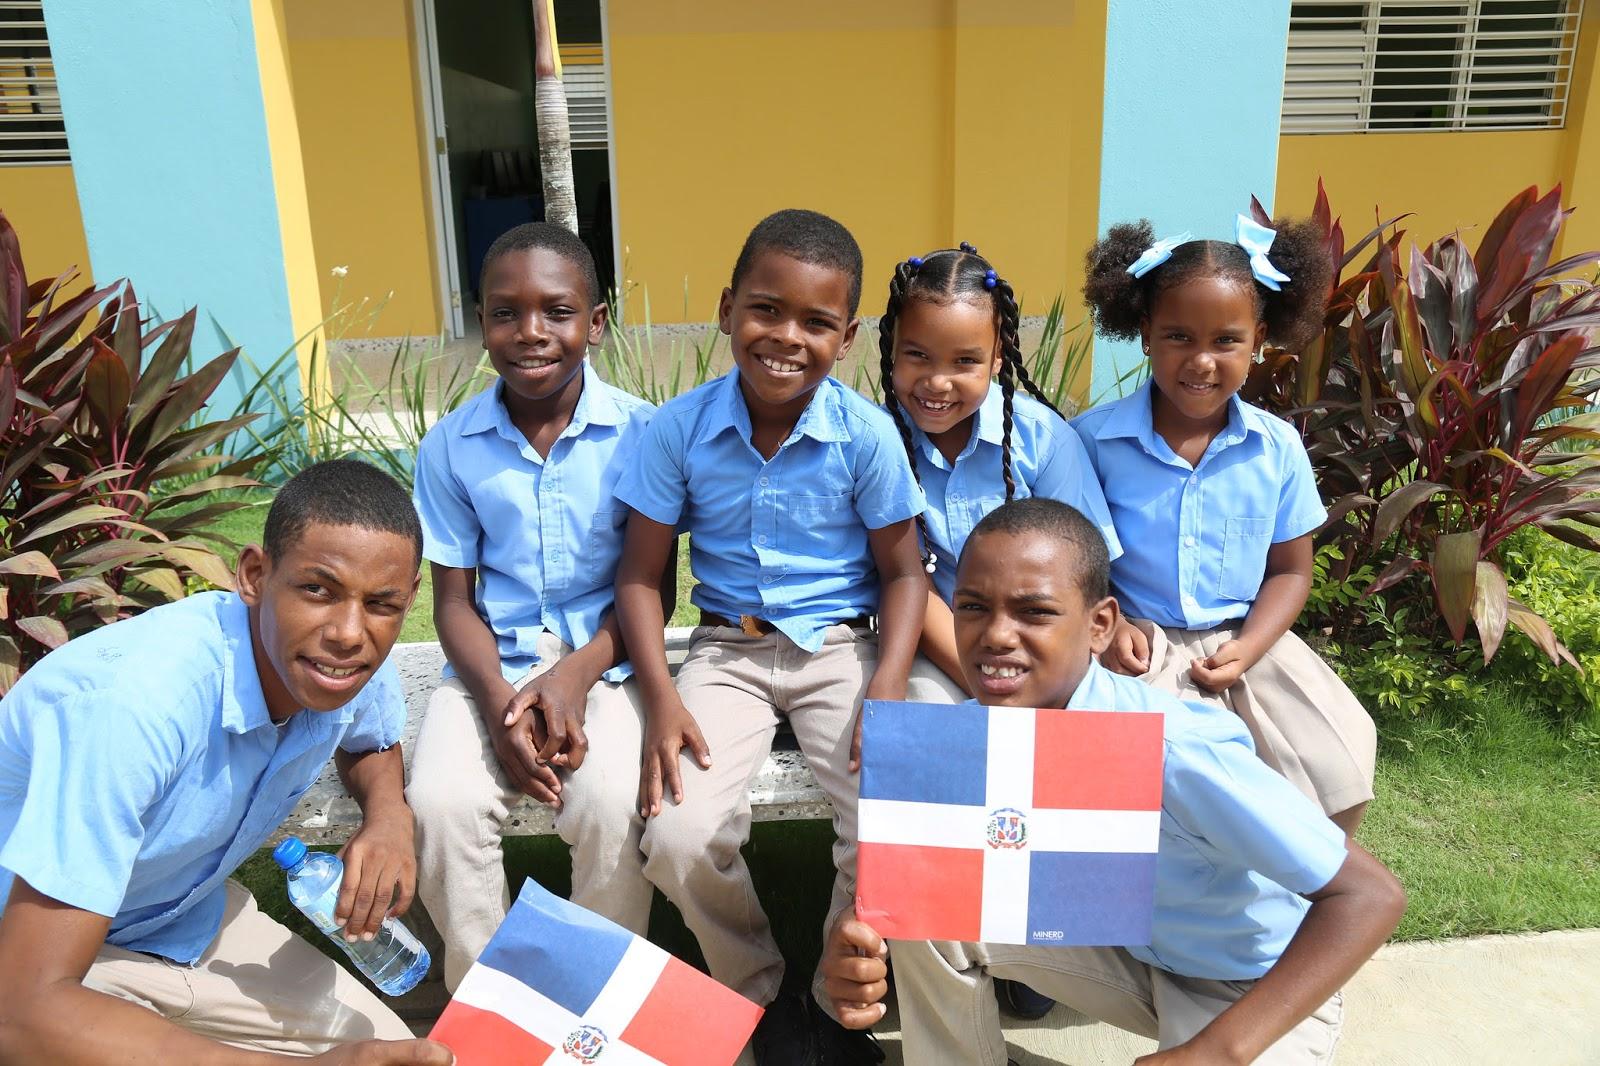 En La Romana, estudiantes de Sinaí reciben anhelada escuela con Jornada Escolar Extendida